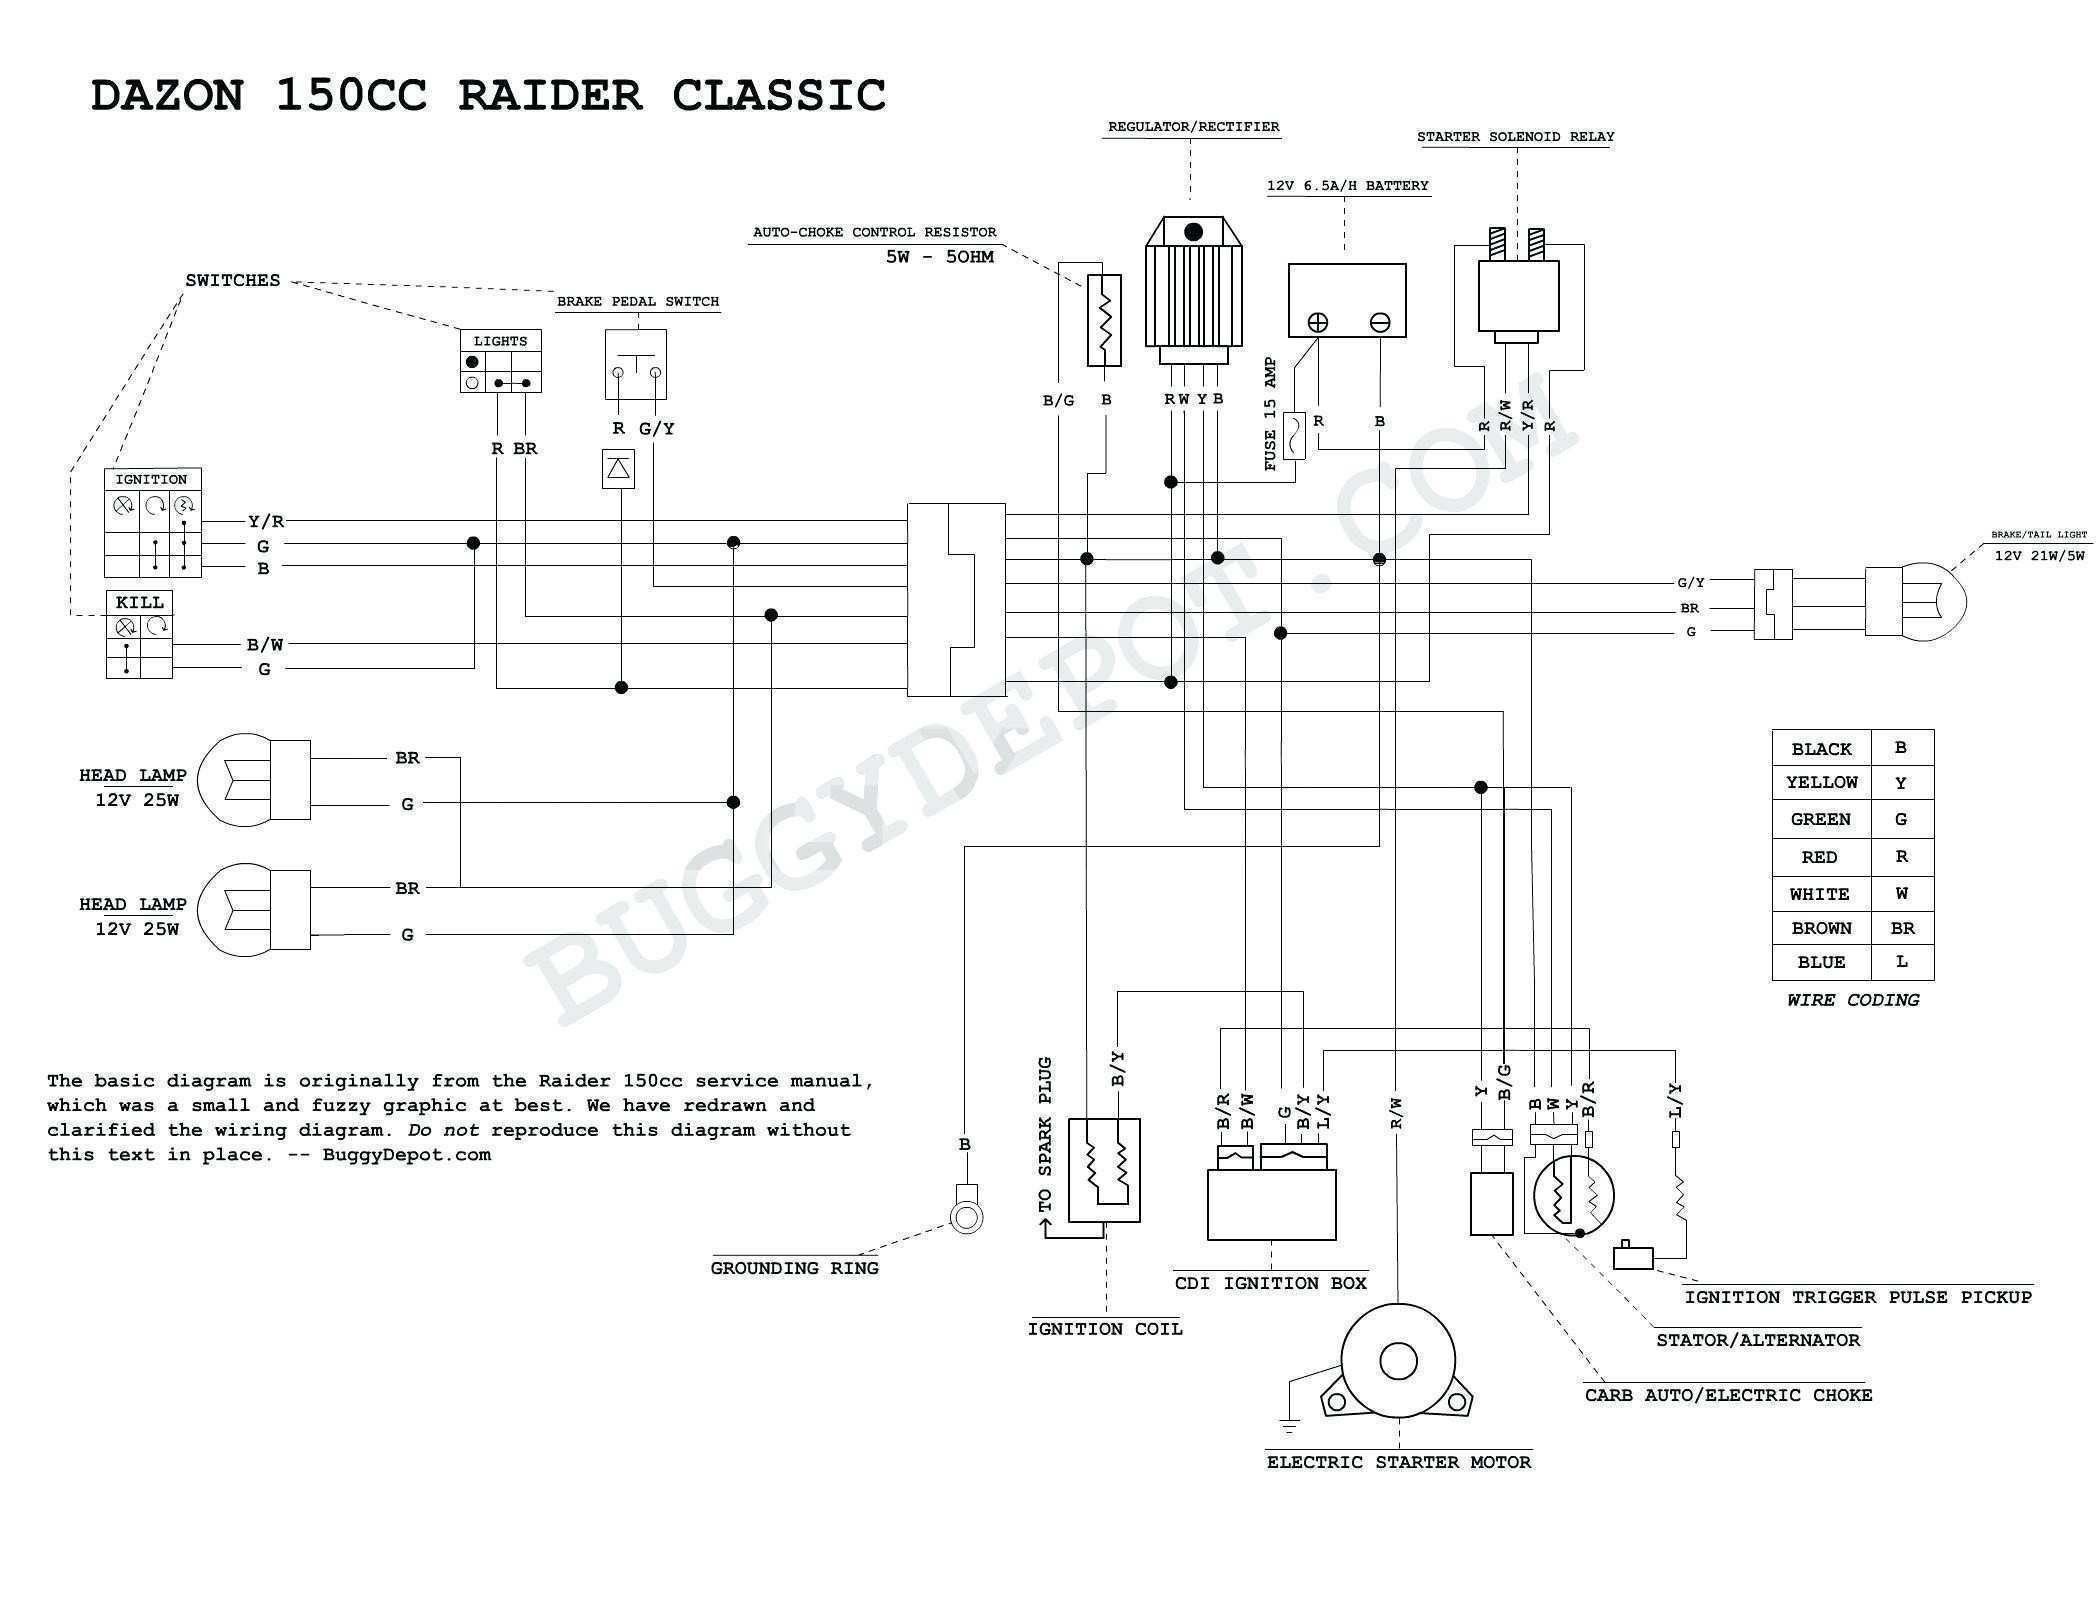 medium resolution of wiring diagram for hogtunes amp diagram diagramtemplate hogtunes wiring diagram